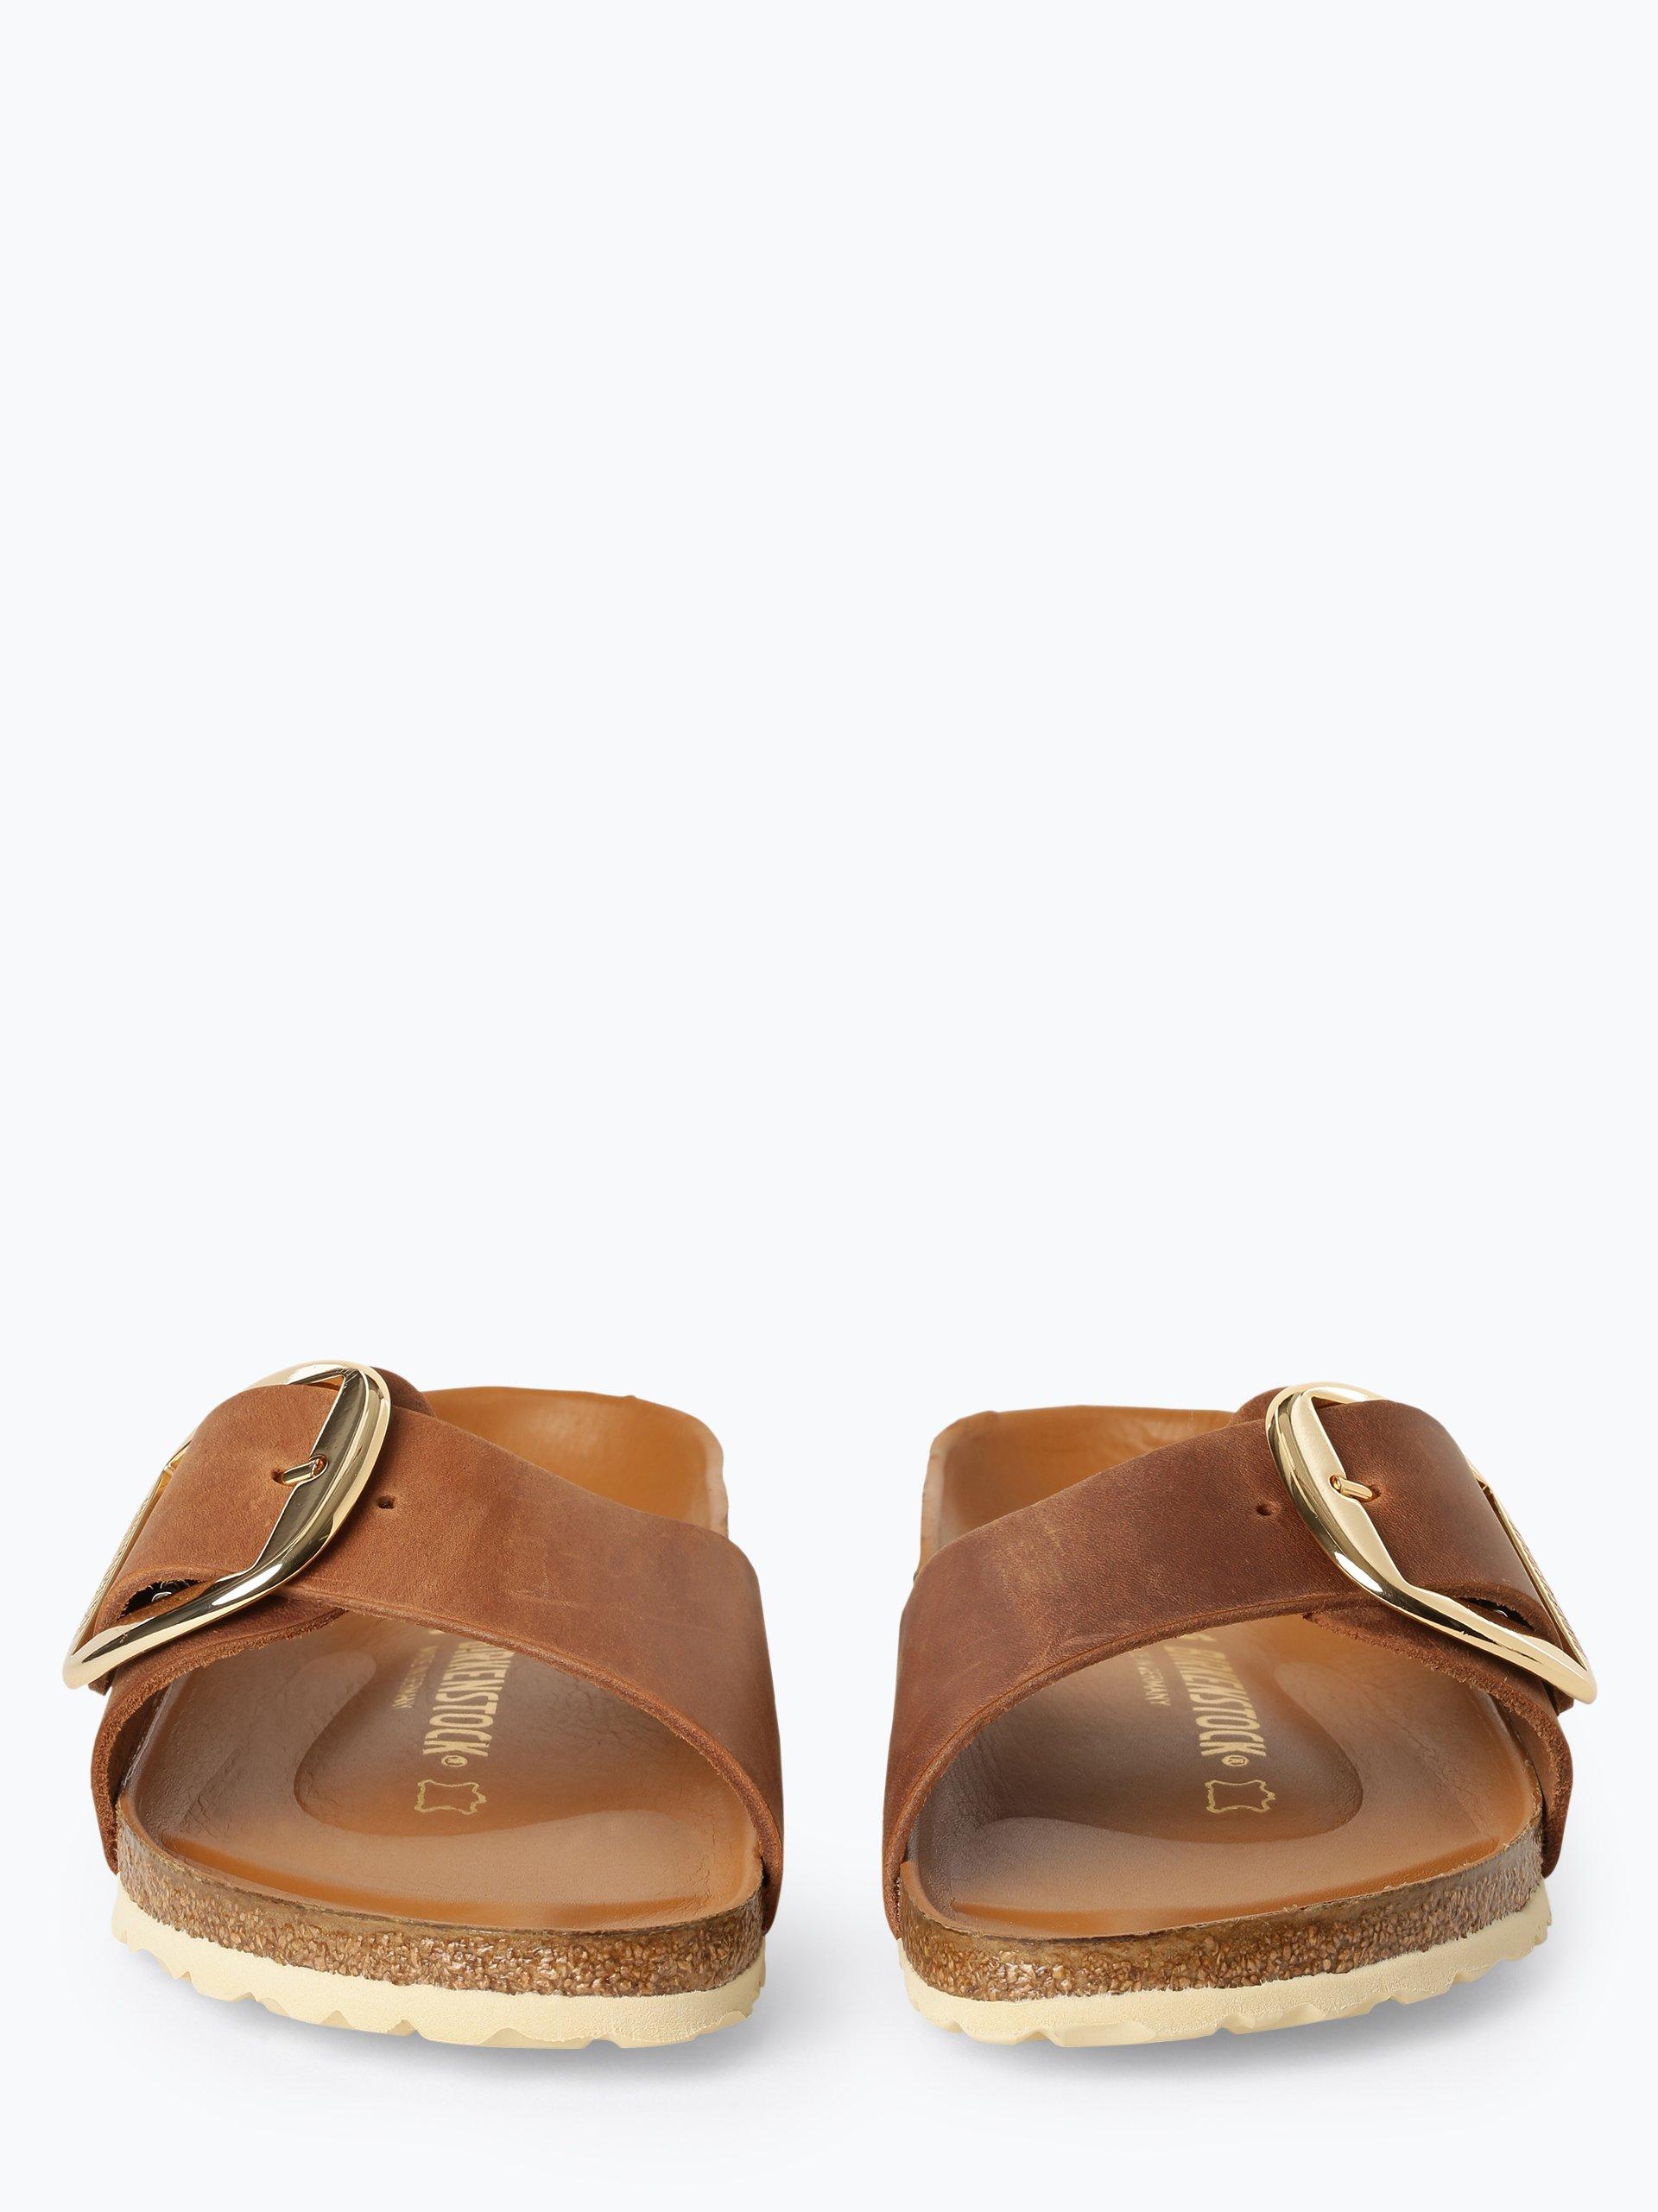 Birkenstock Damen Sandalen aus Leder - Madrid Big Buckle